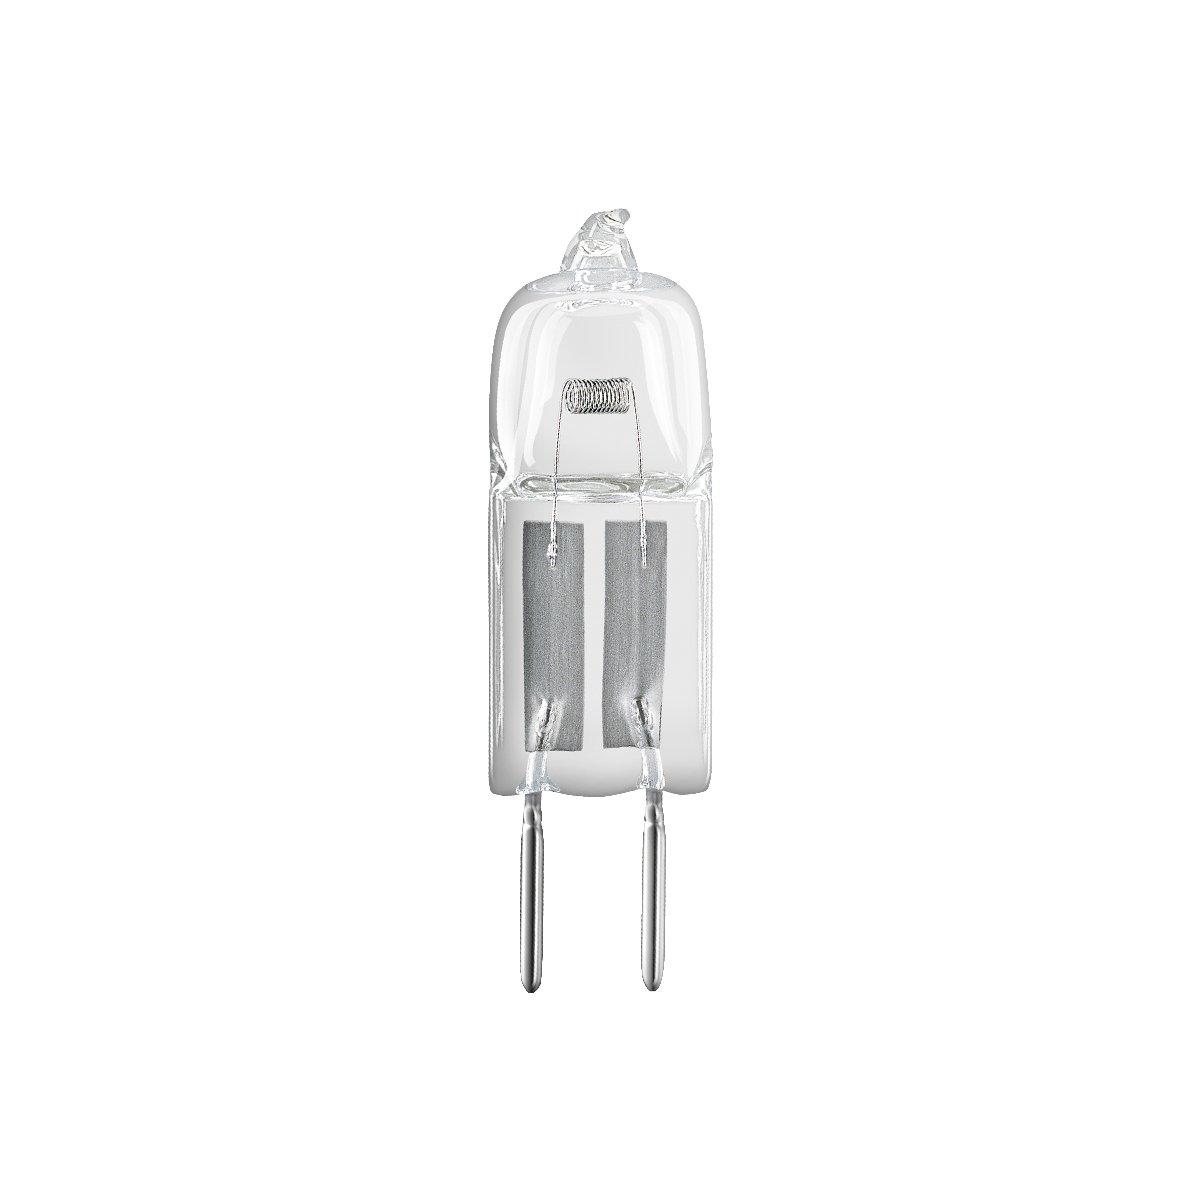 Halostar G4-Sockel 2800K Osram Halogen-Lampe basse tension douille Lot de 2 20 Watt,Blanc chaud 12 Volt